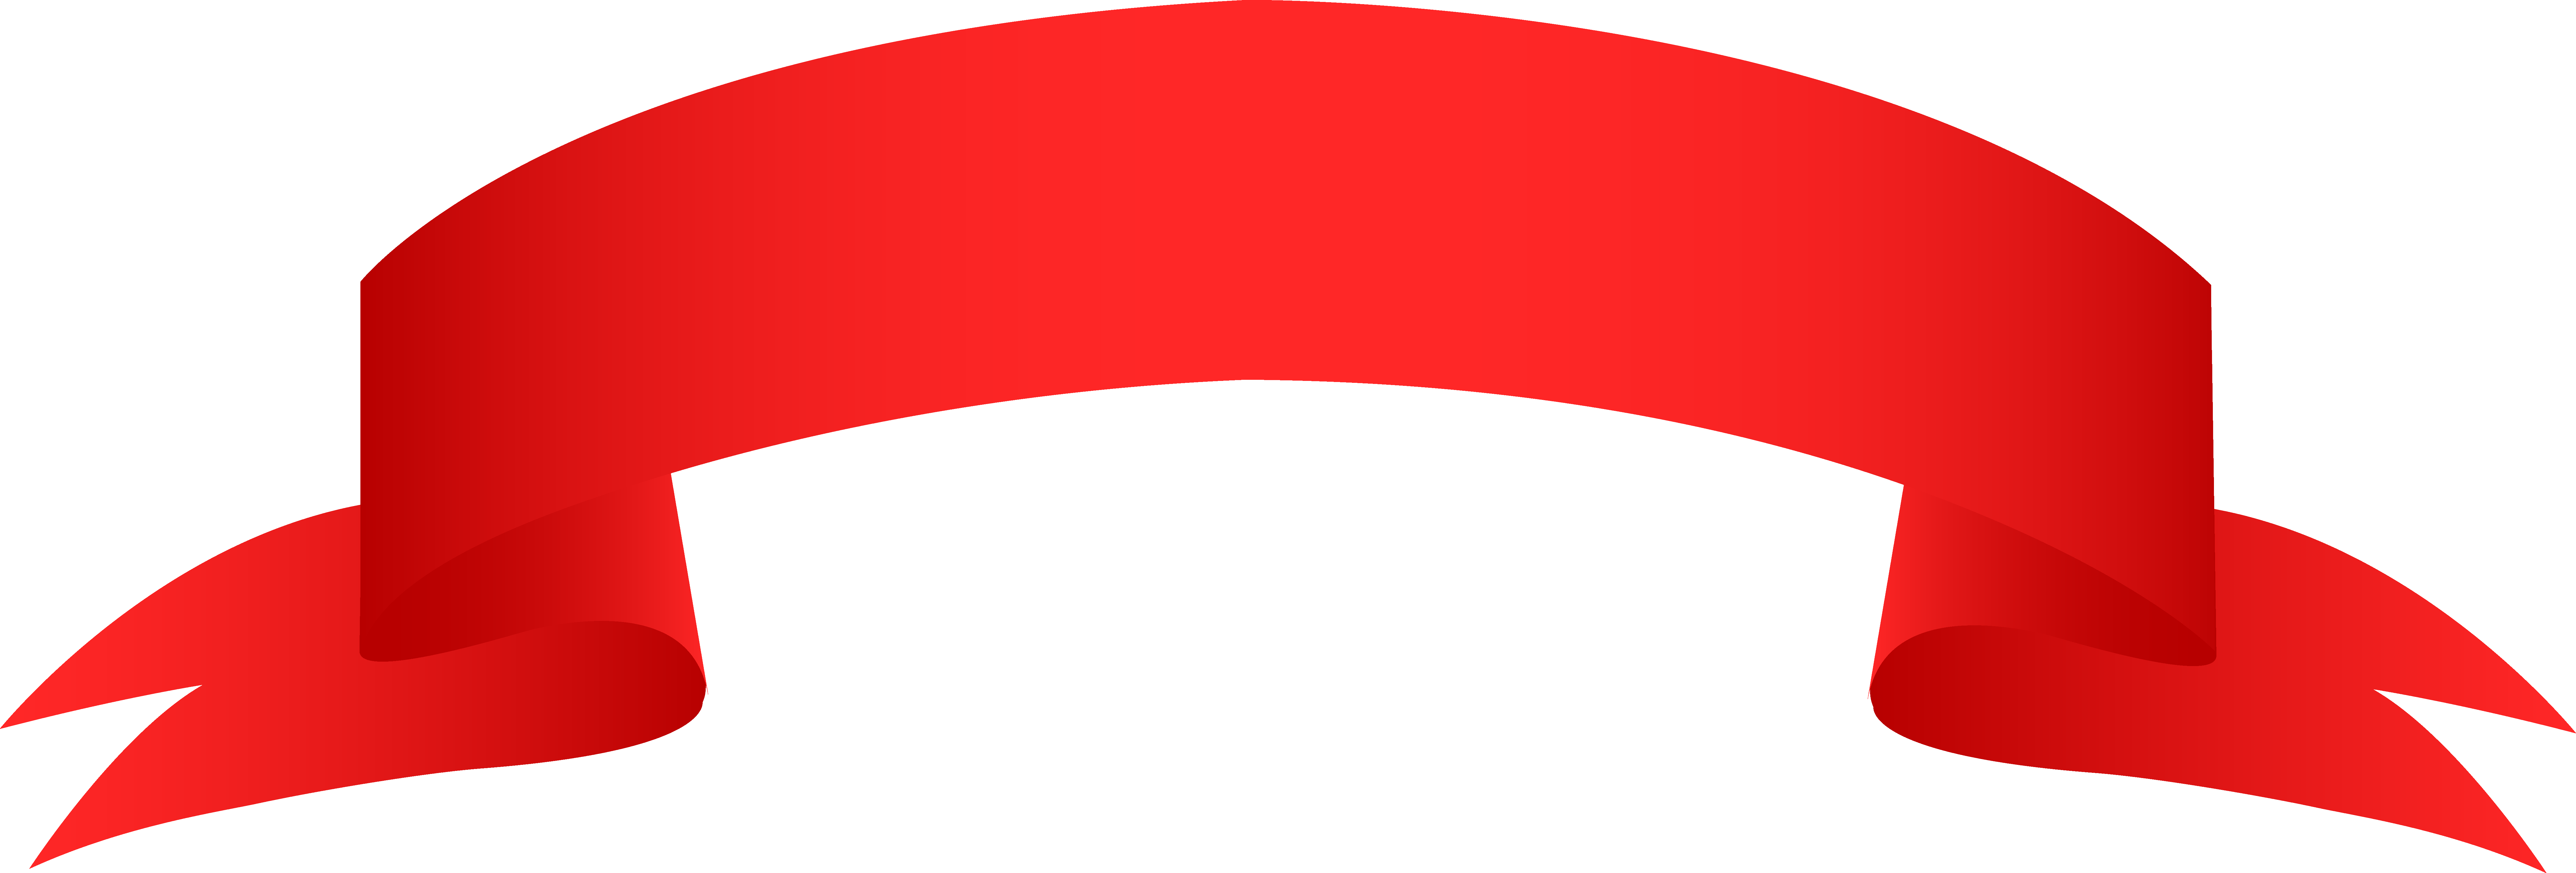 9356x3172 Ribbon Banner Clipart